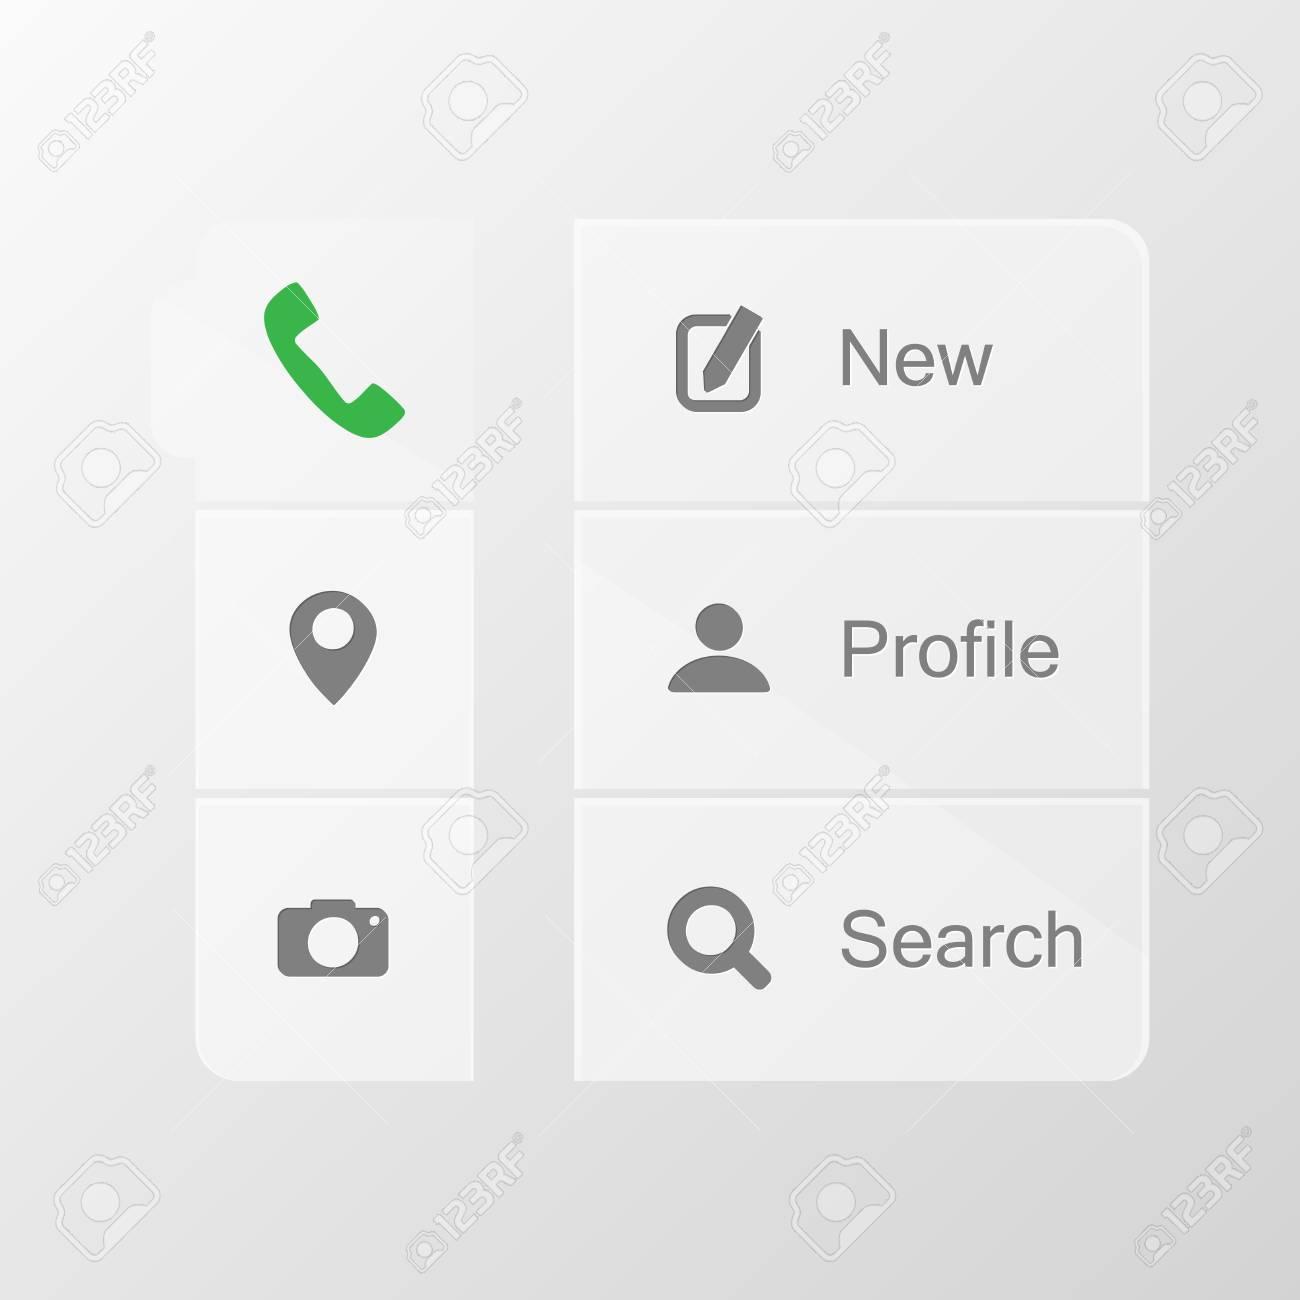 Smart phone application icon set Stock Vector - 23099343